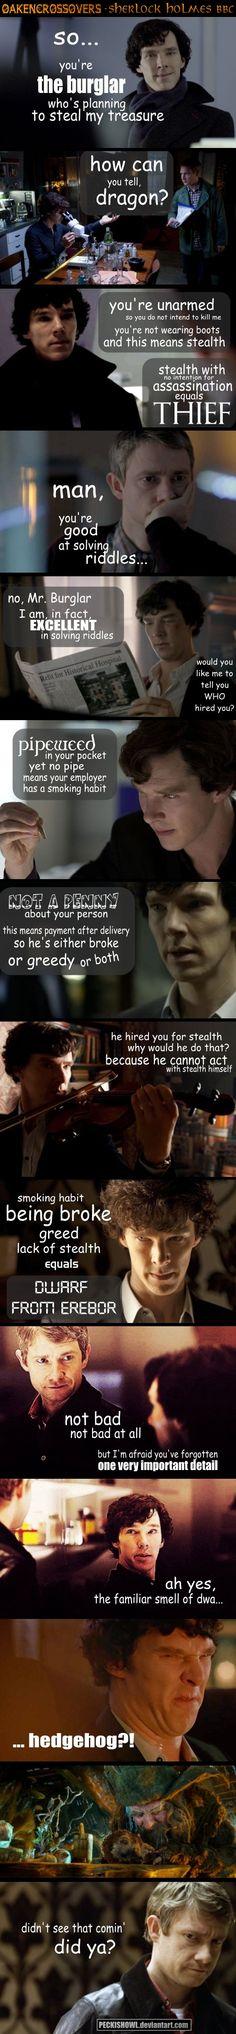 Oakencrossover #14: Sherlock Holmes by *PeckishOwl on deviantART